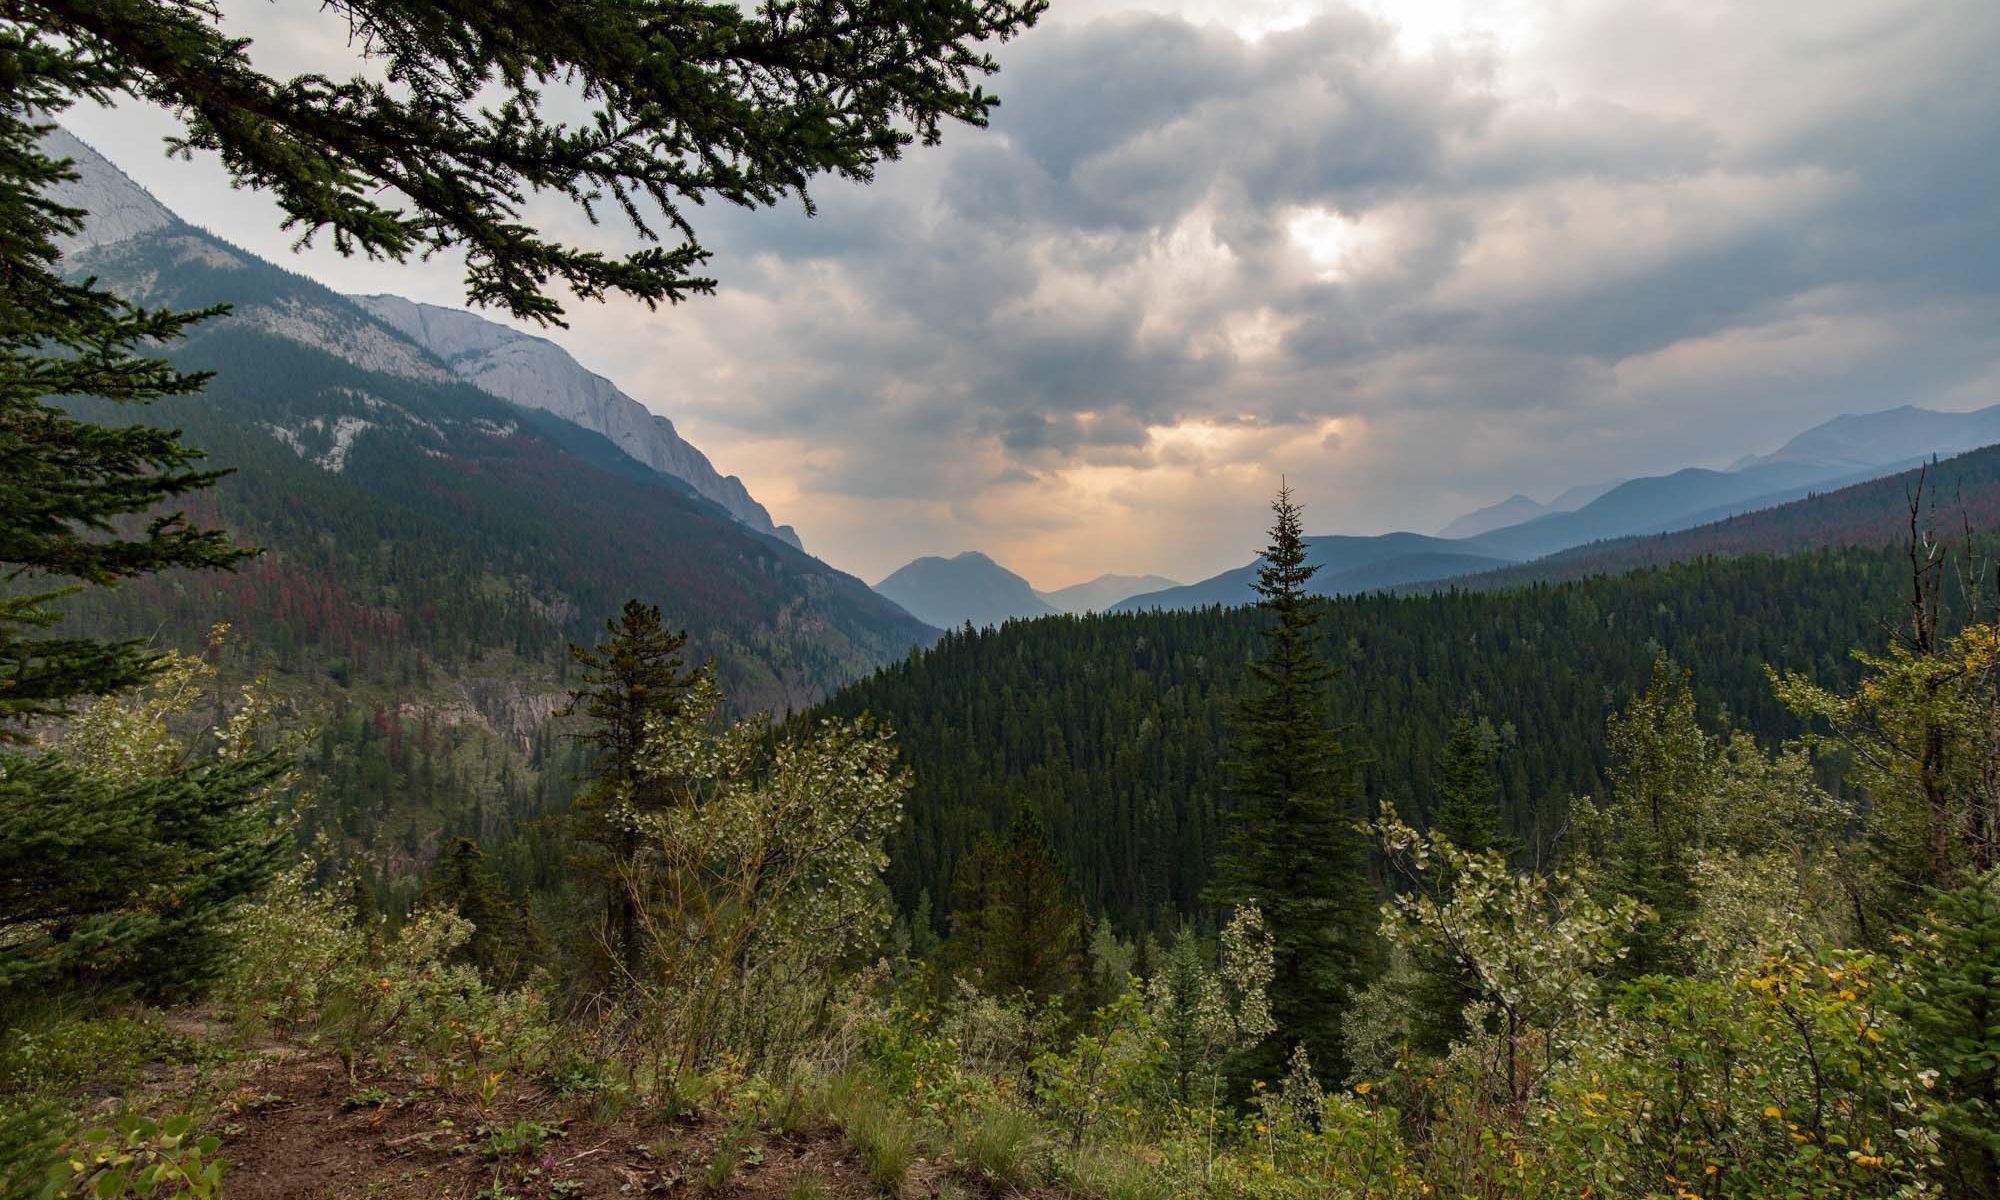 Miette Hotsprings - Tal im Jasper Nationalpark in den Rockie Mountains